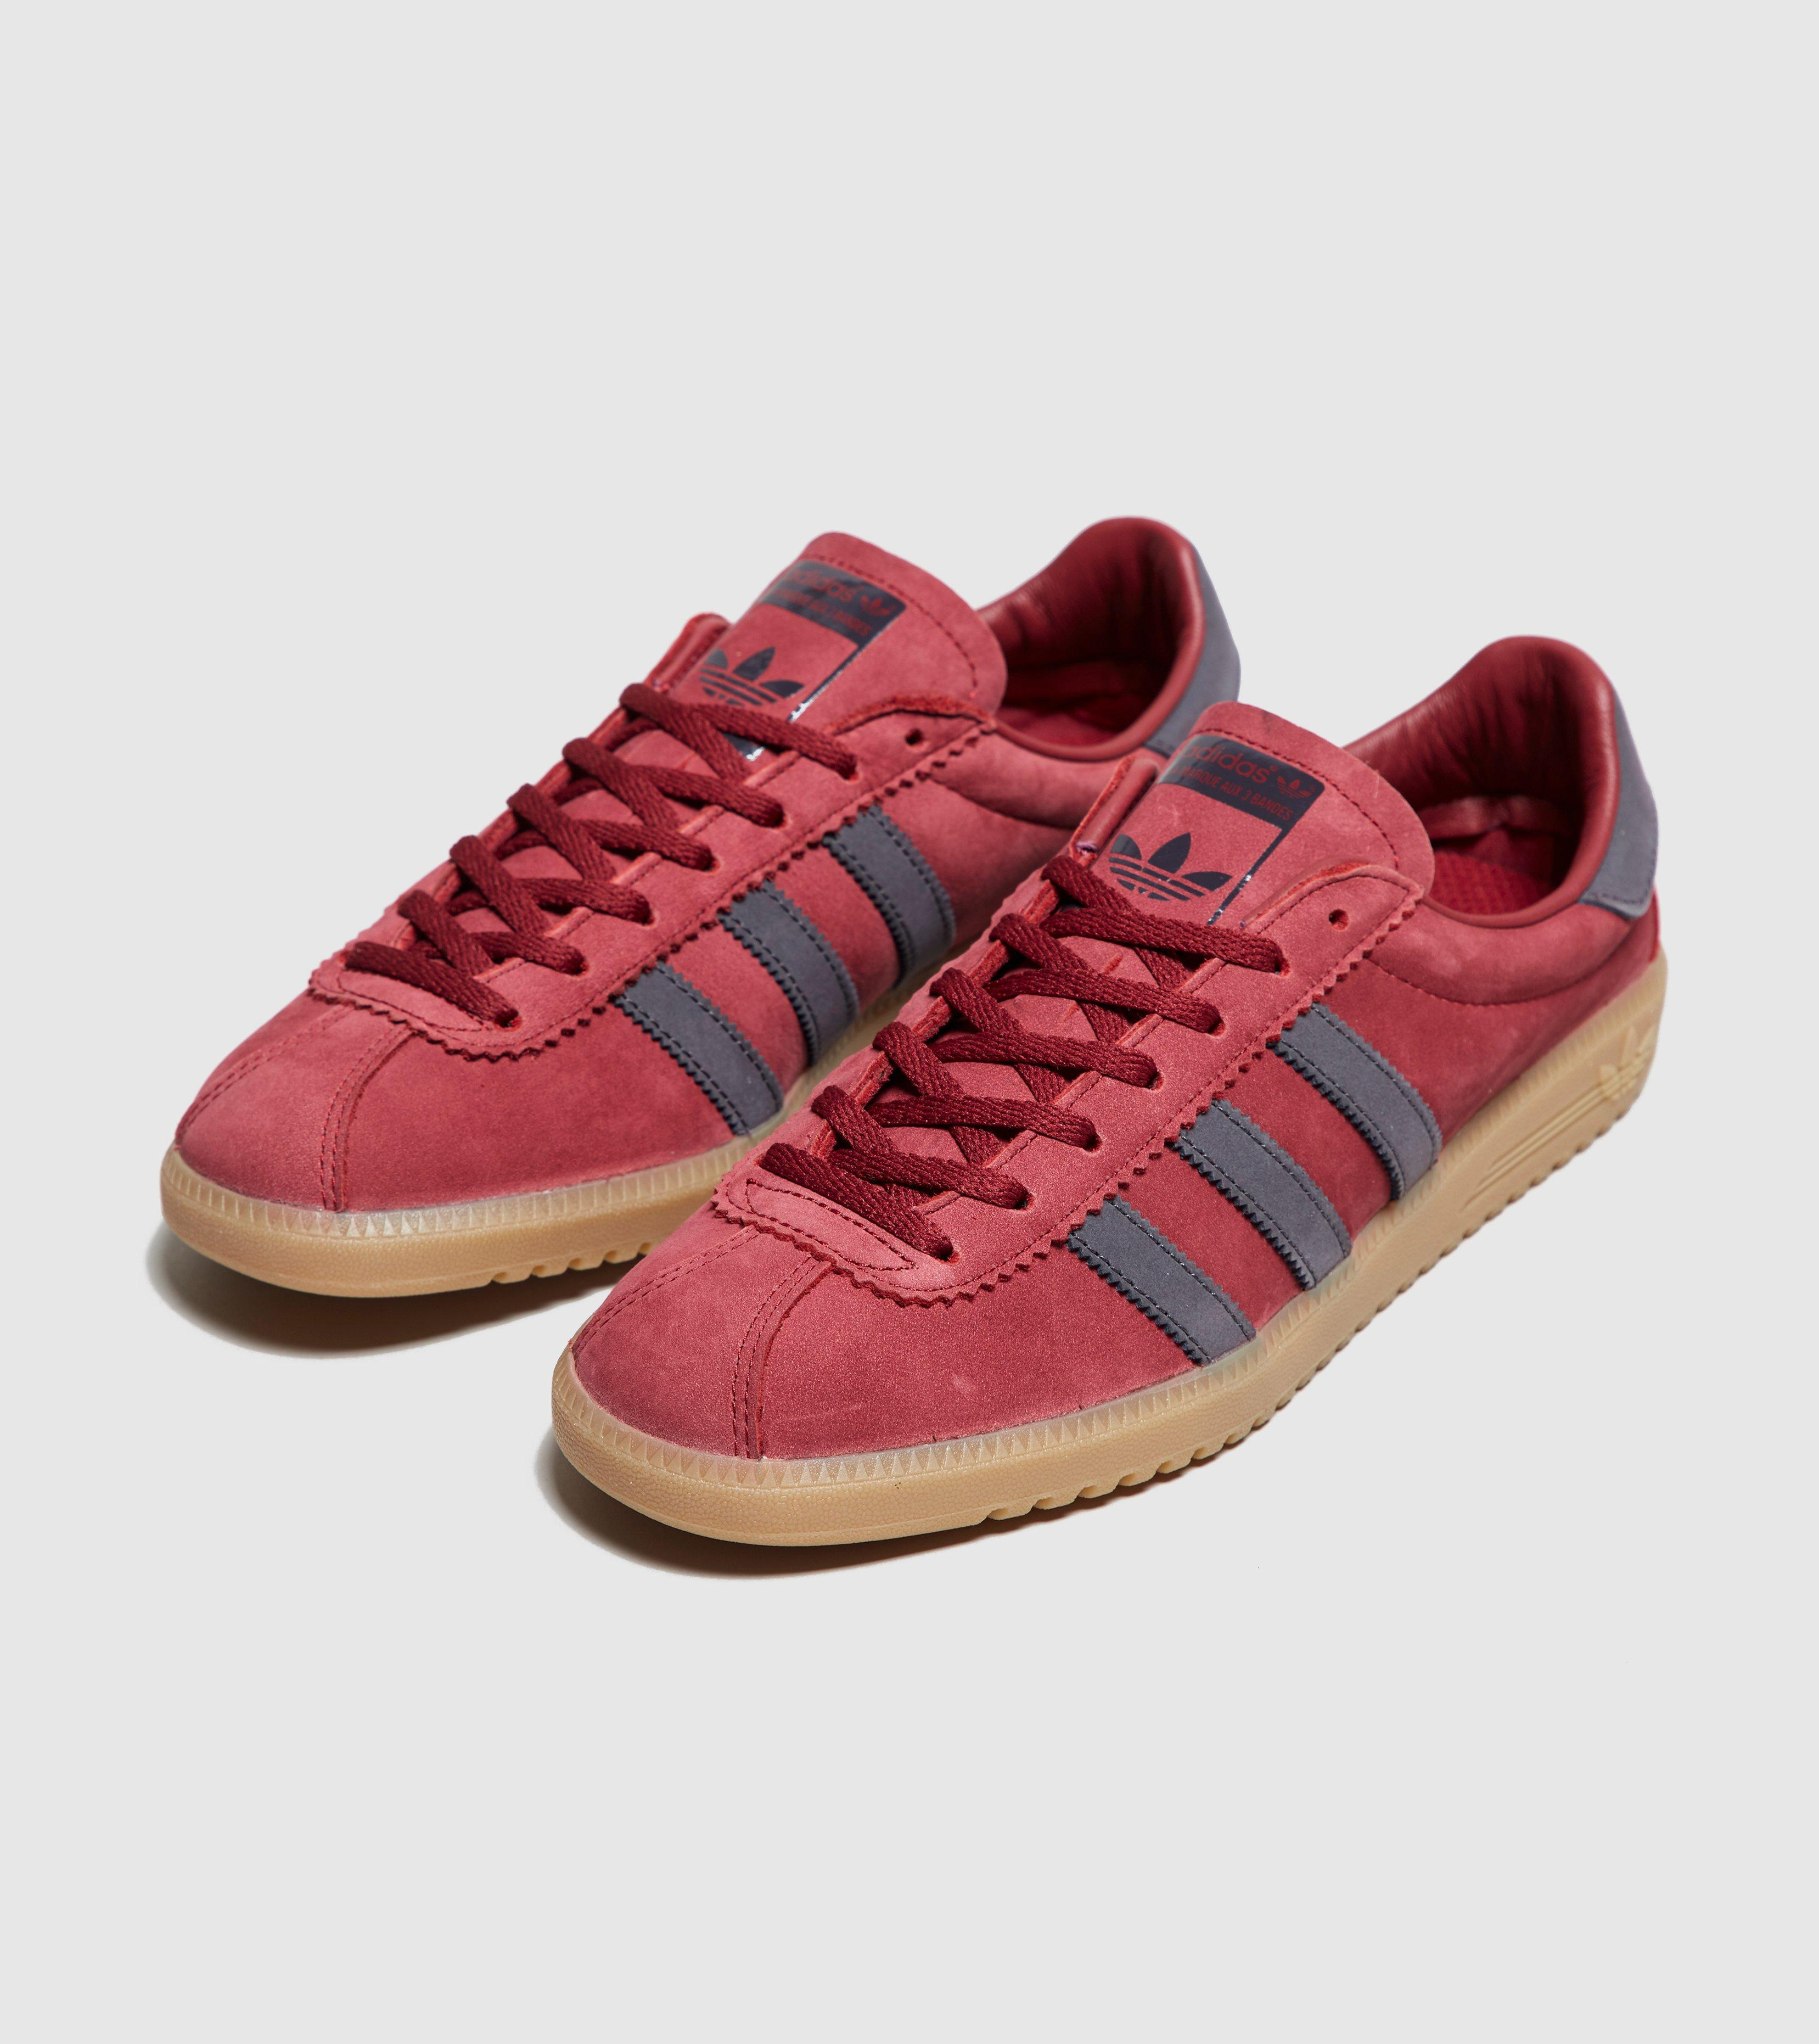 buy online e8710 00990 adidas Originals Bermuda in Red for Men - Lyst